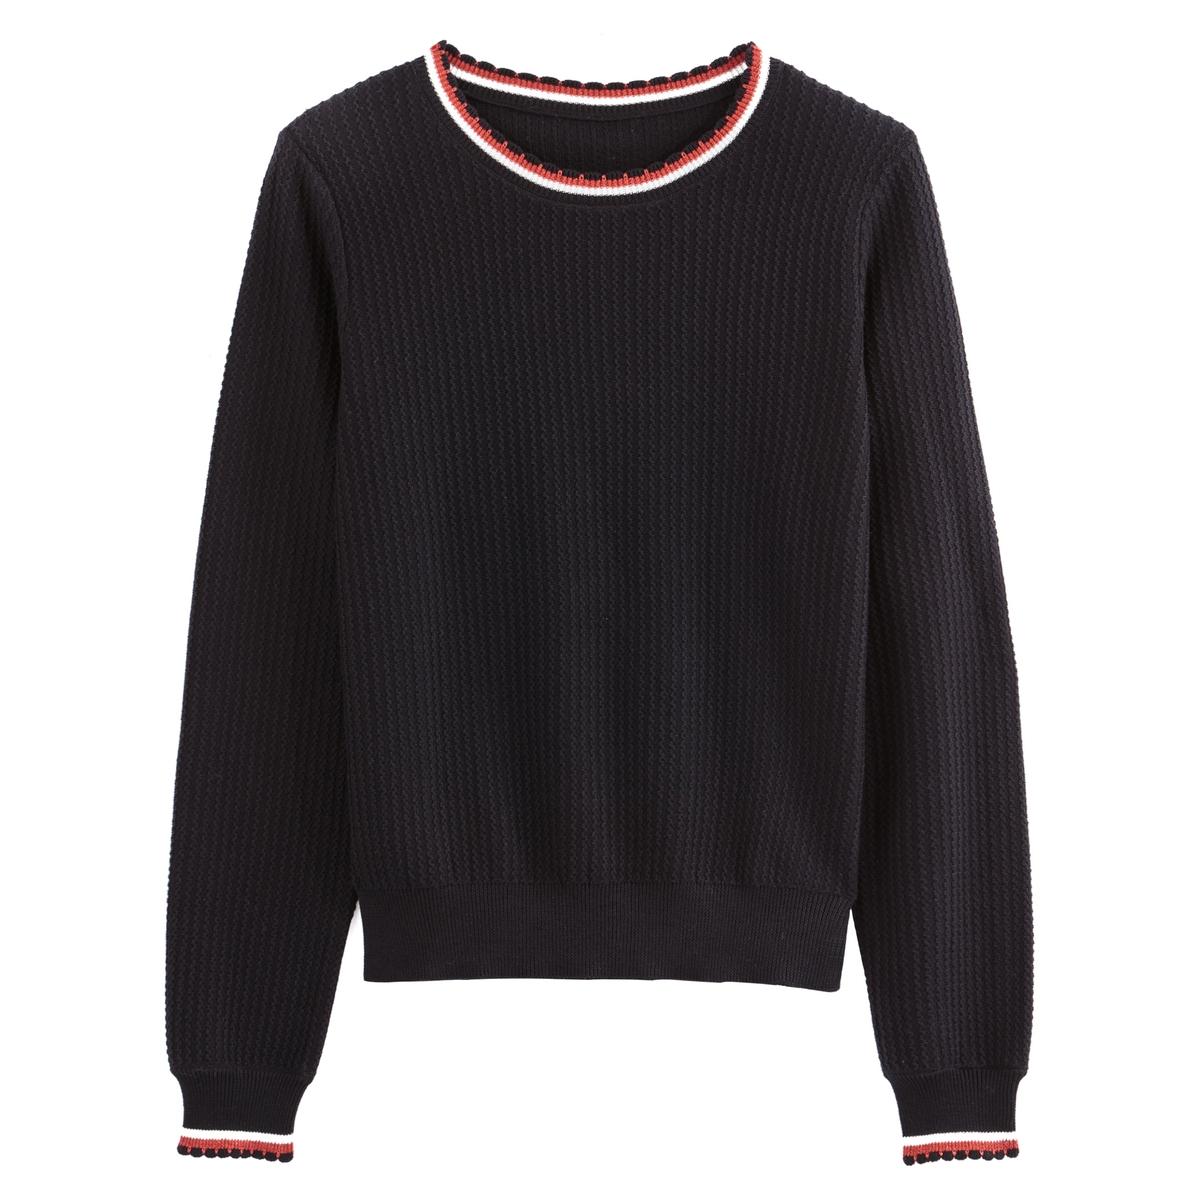 Jersey con cuello redondo de punto fino con detalles deportivos